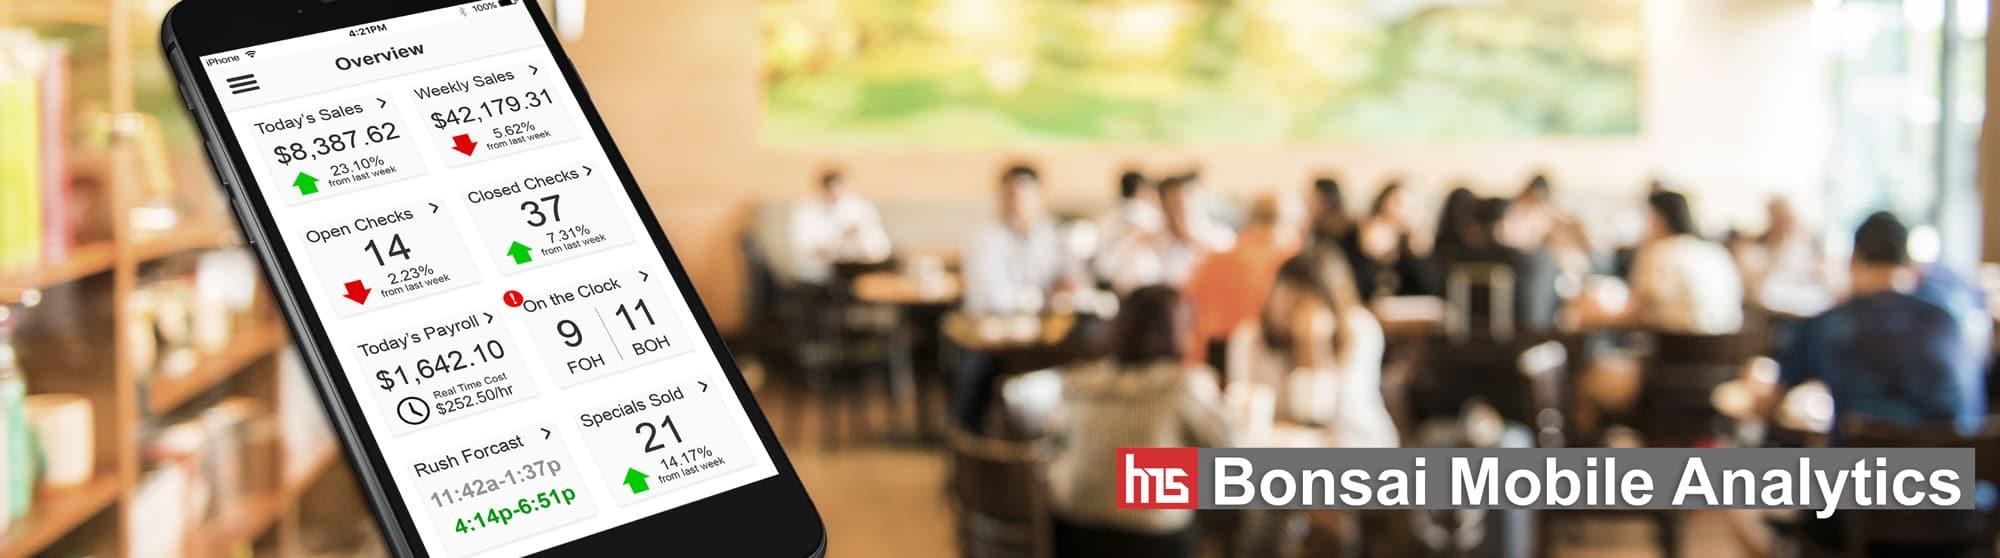 Bonsai Mobile Analytics App